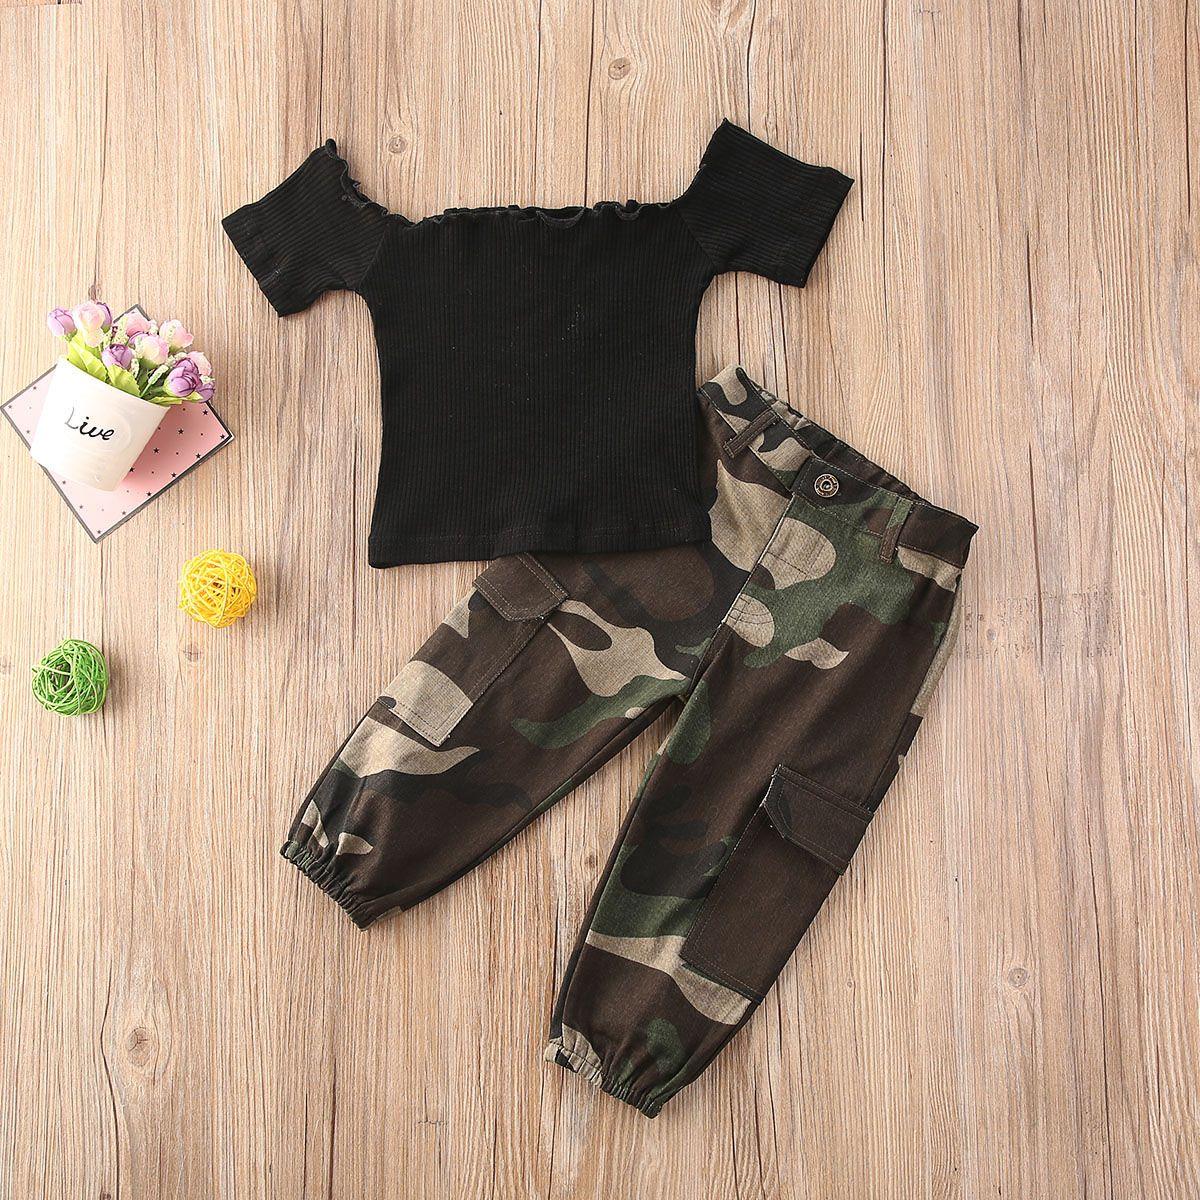 1-6Y Mode-Säuglingsbaby-Mädchen-Kleidung setzt Schulter-T-Shirts-Tops + Tarn-Pants 2pcs Kinder-Kindersätze